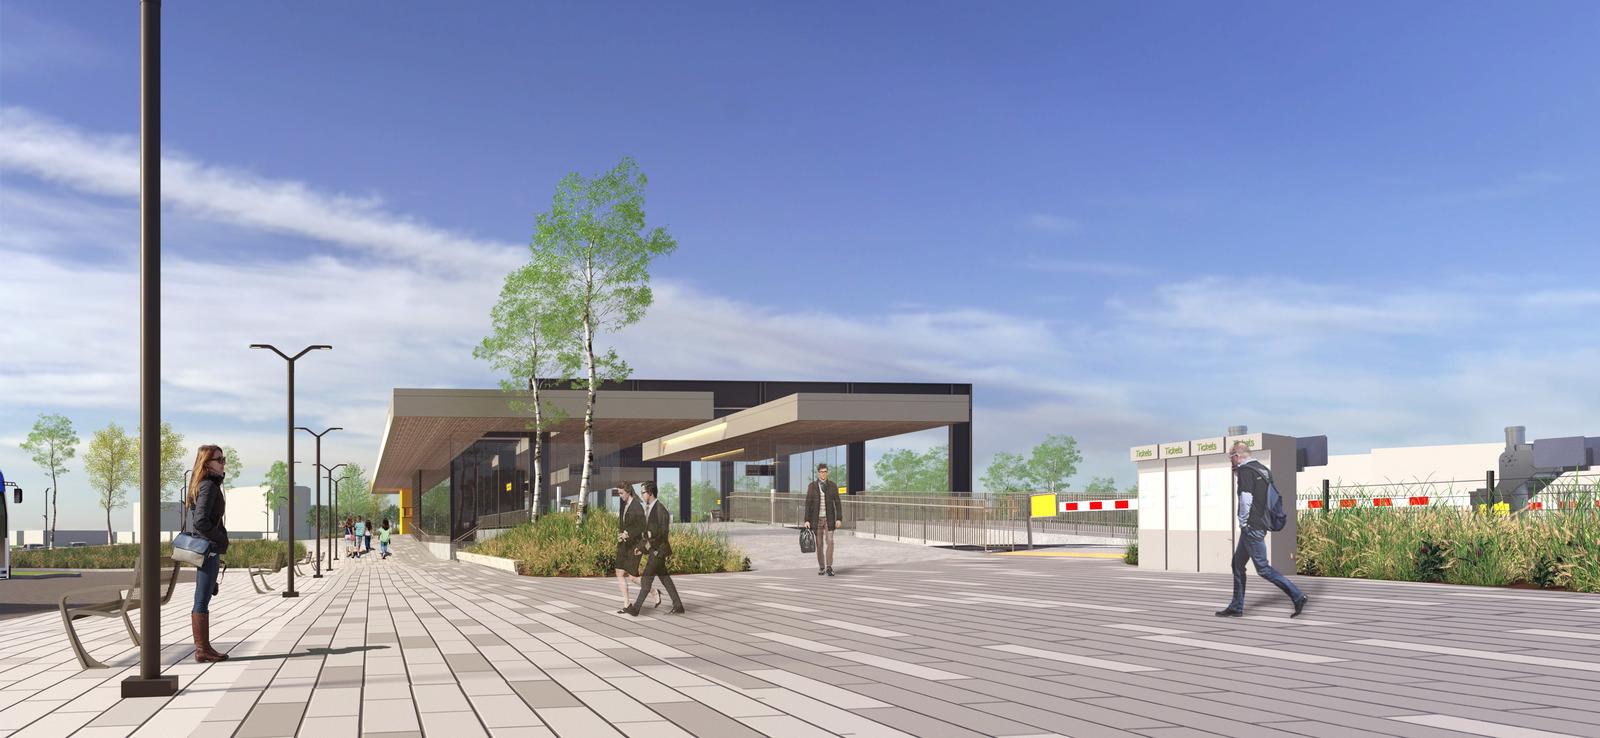 STADIUM_transit_center_north_rdax_1600x738.jpg